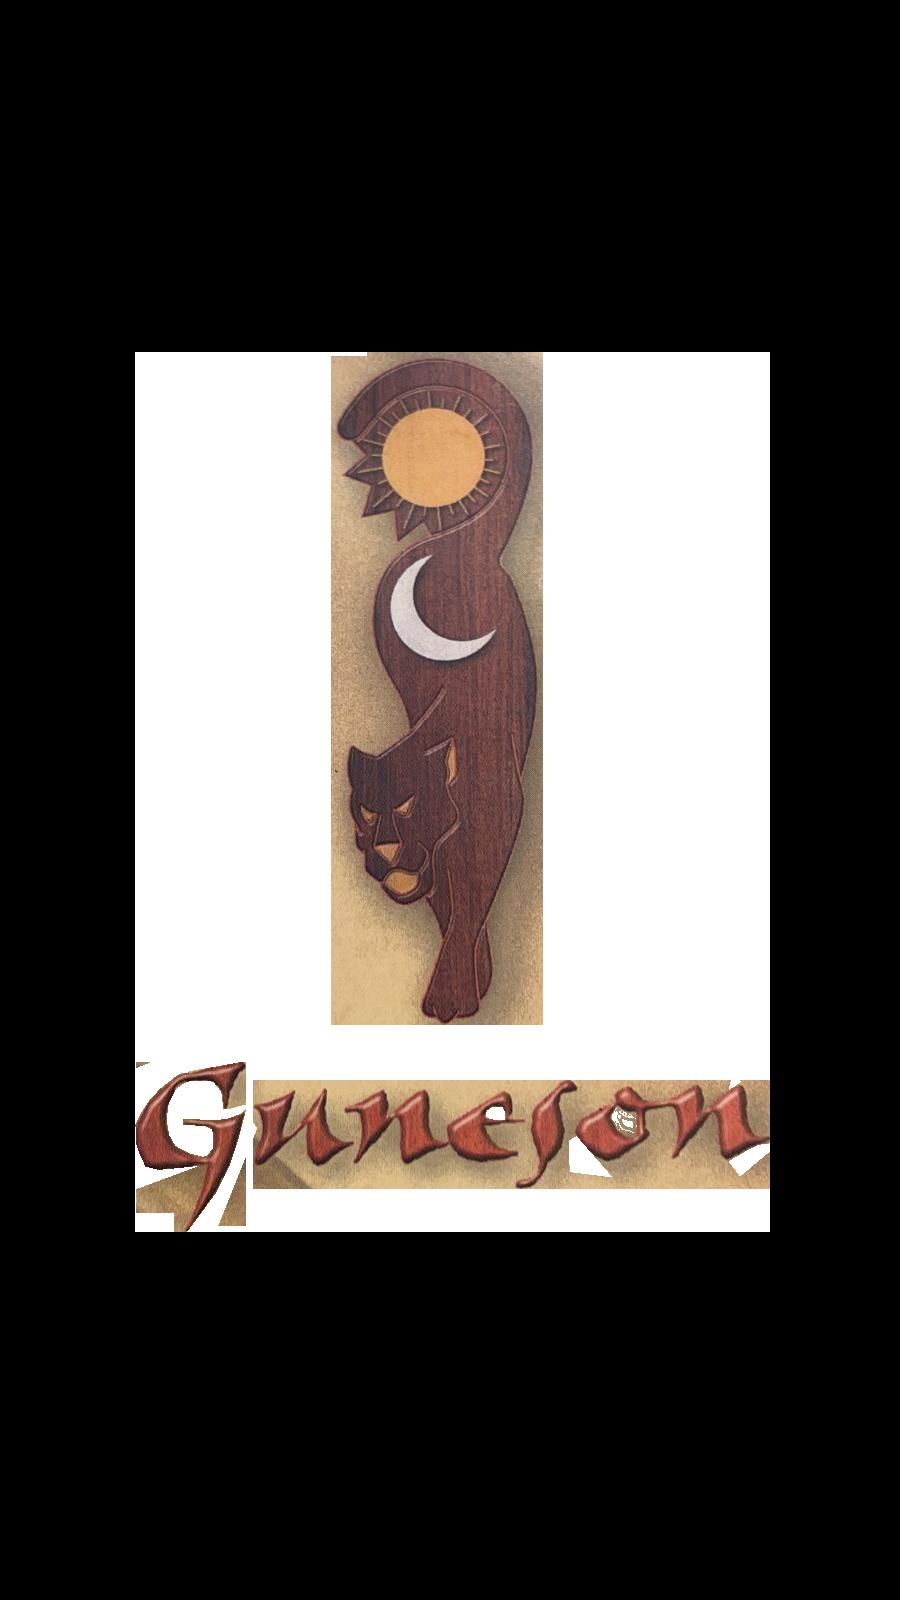 Guneson logo